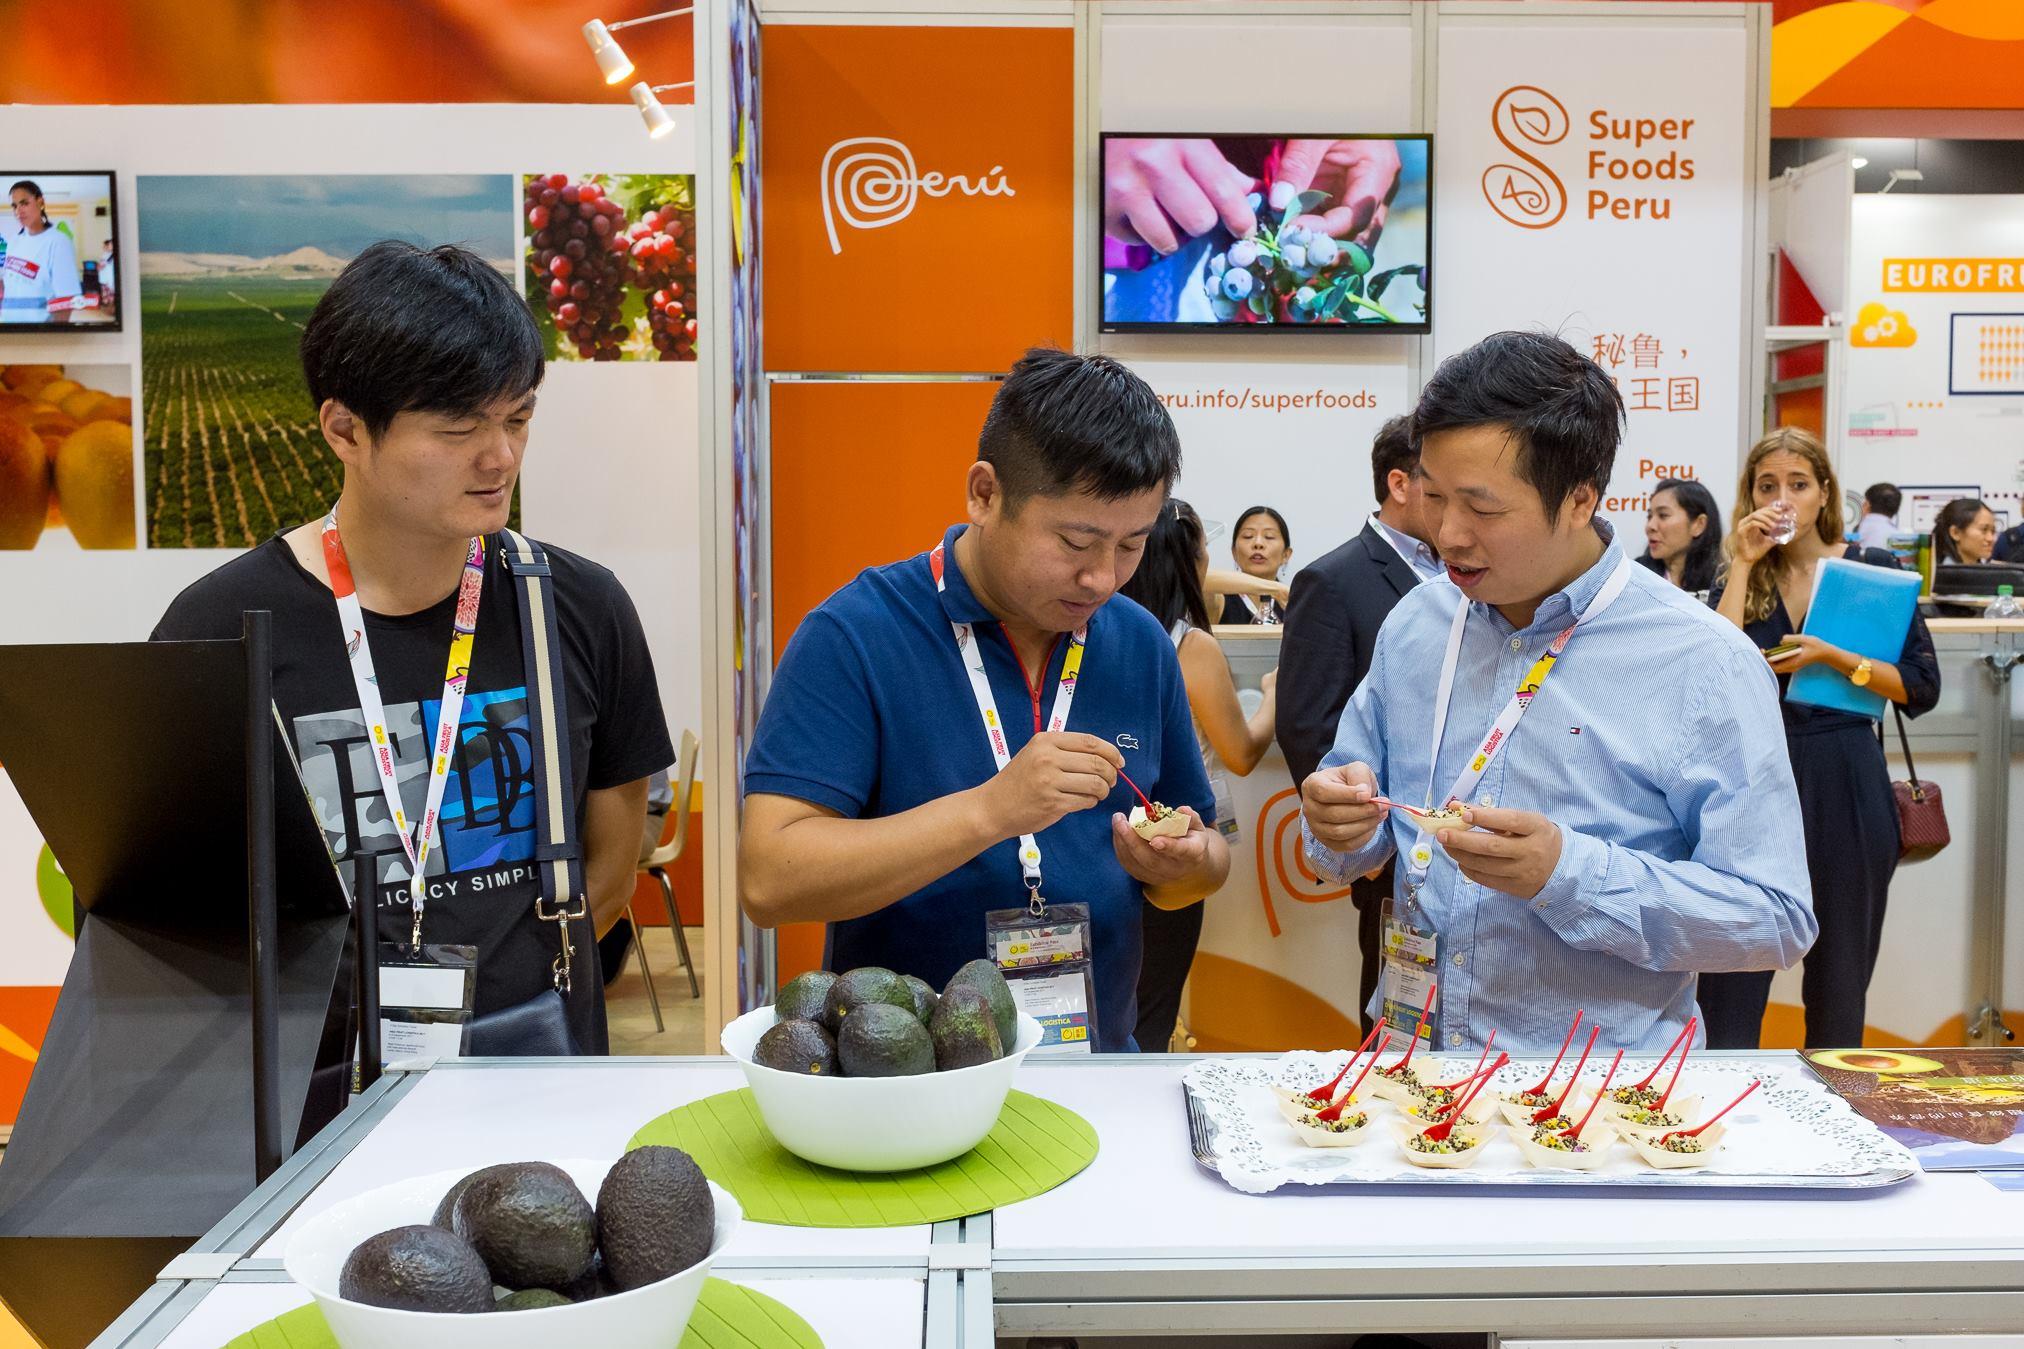 super foods peru asia fruit logistica 2017 2 - Super Foods Peru concretan negocios por US$ 138 millones en Asia